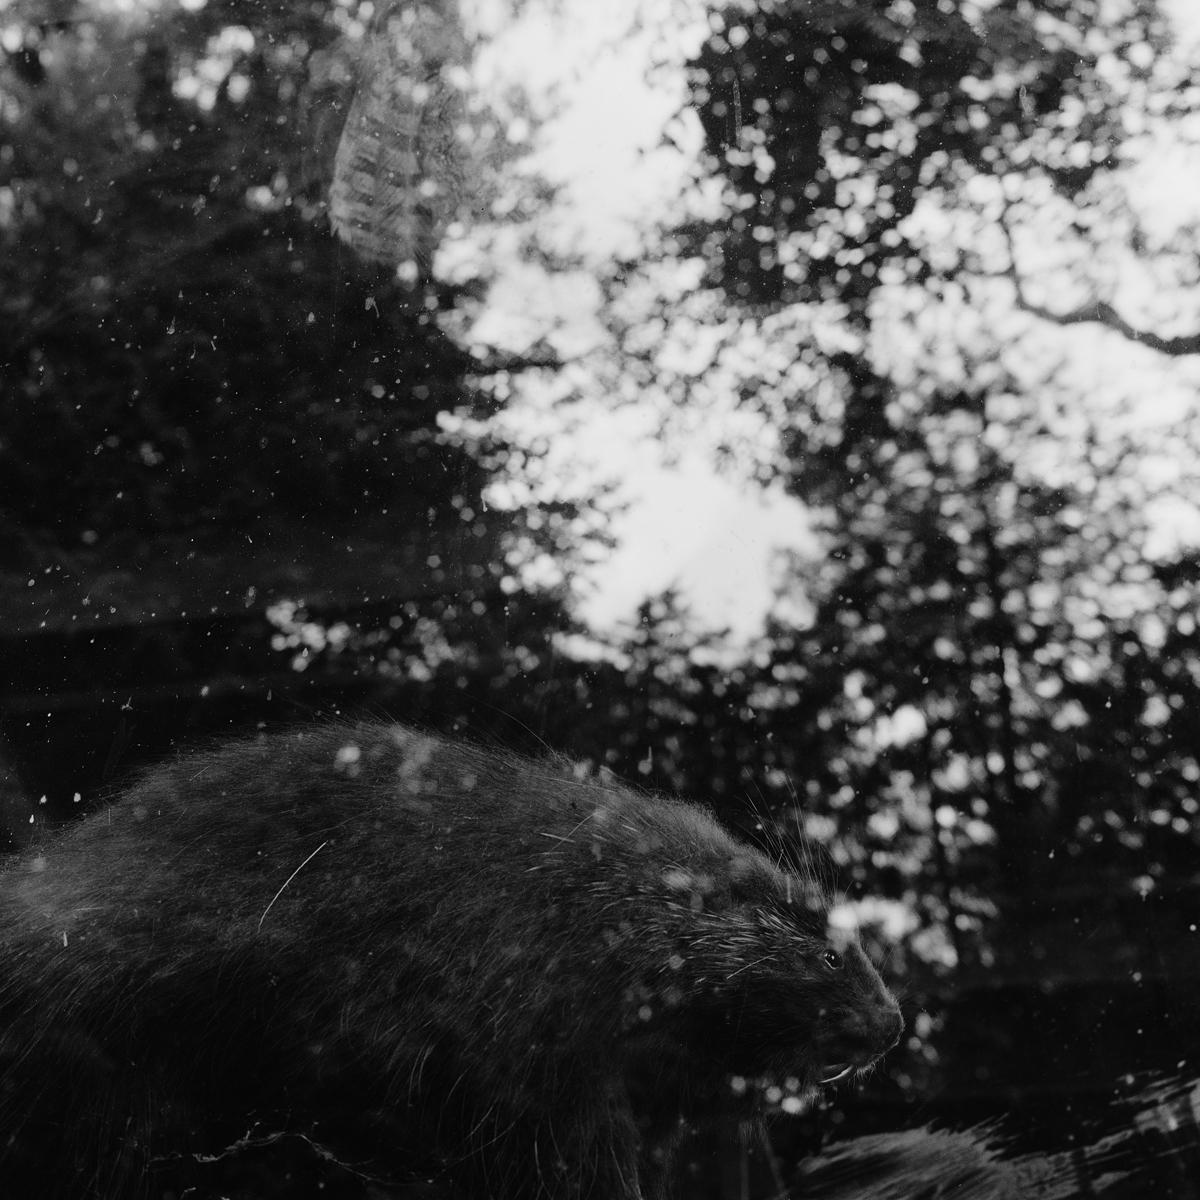 3. Beaver and Window Reflections, Adirondack Loj, NY. 1999. Toned Gelatin Silver Print.